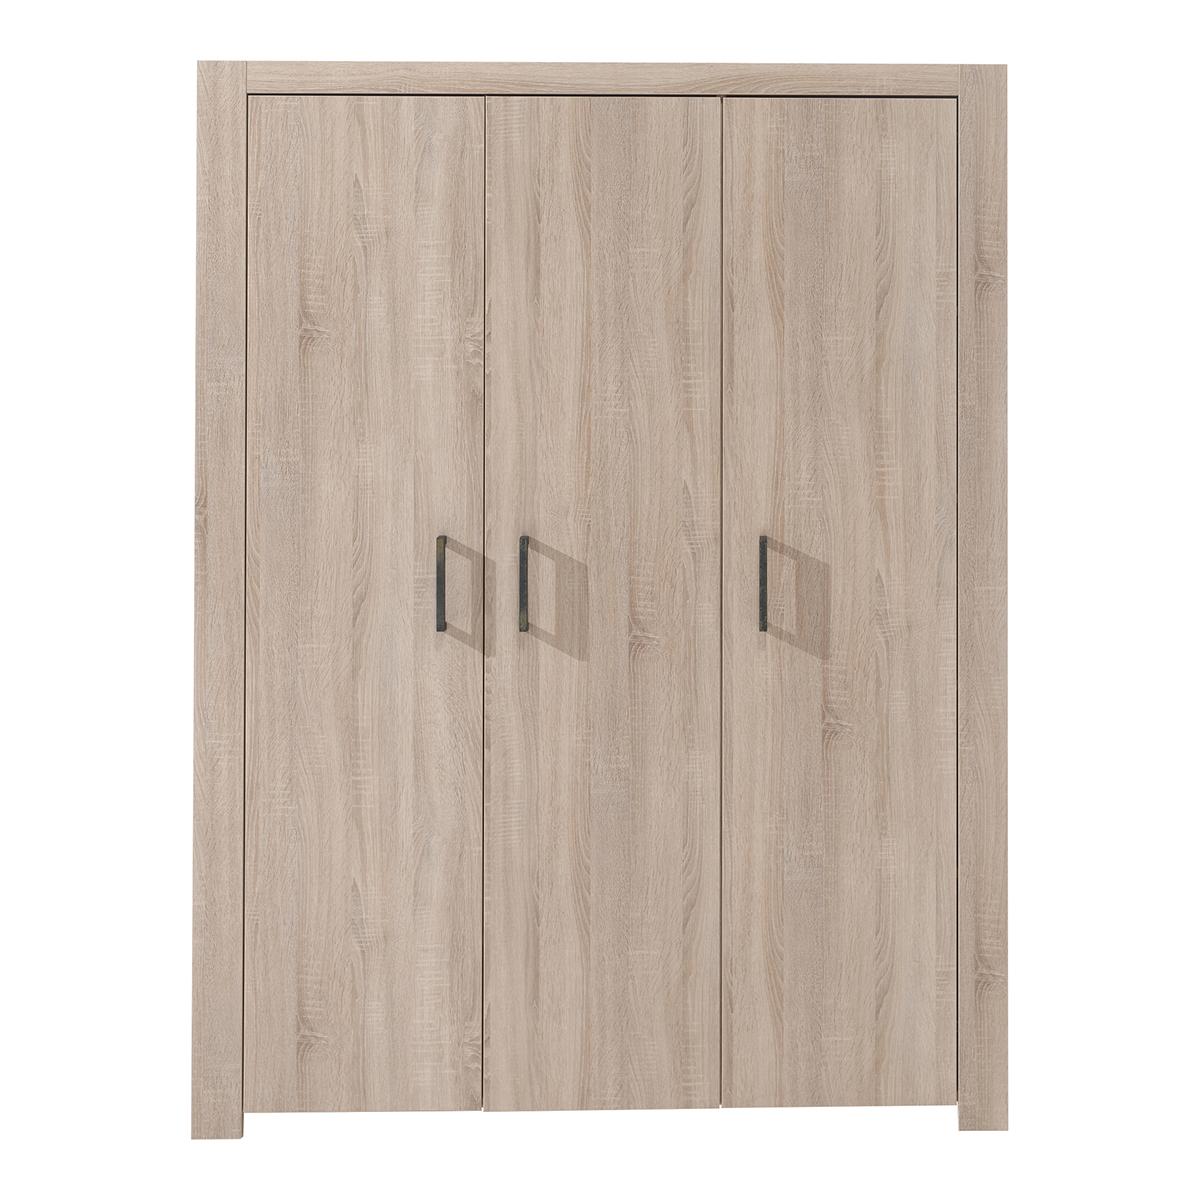 Armoire 3 portes bois